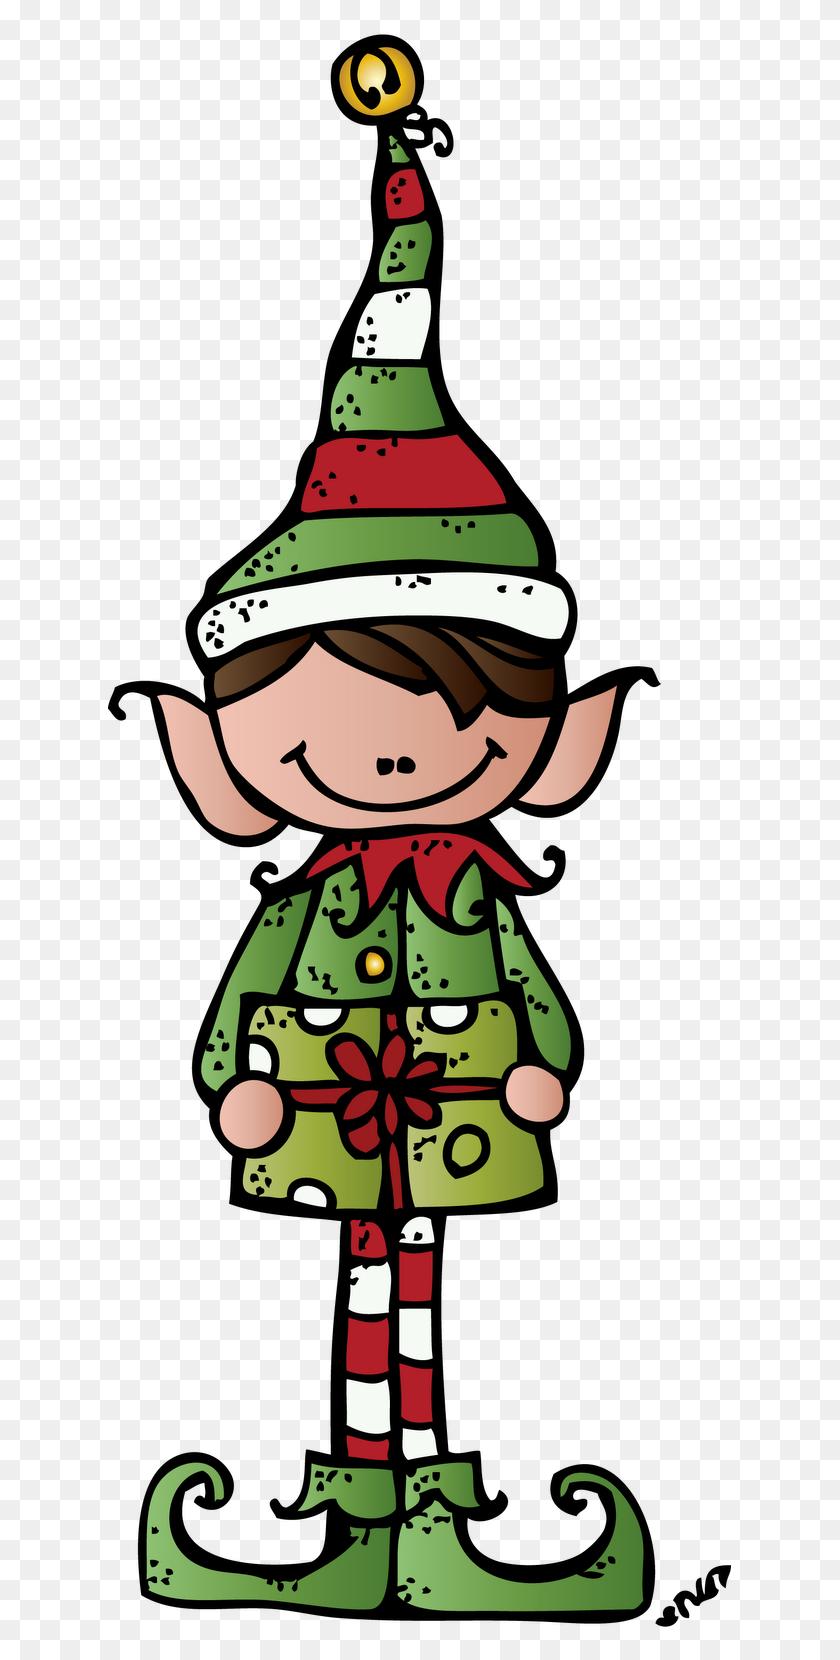 623x1600 Melonheadz Christmas Zfdeid Image Clip Art - Melonheadz Christmas Clipart